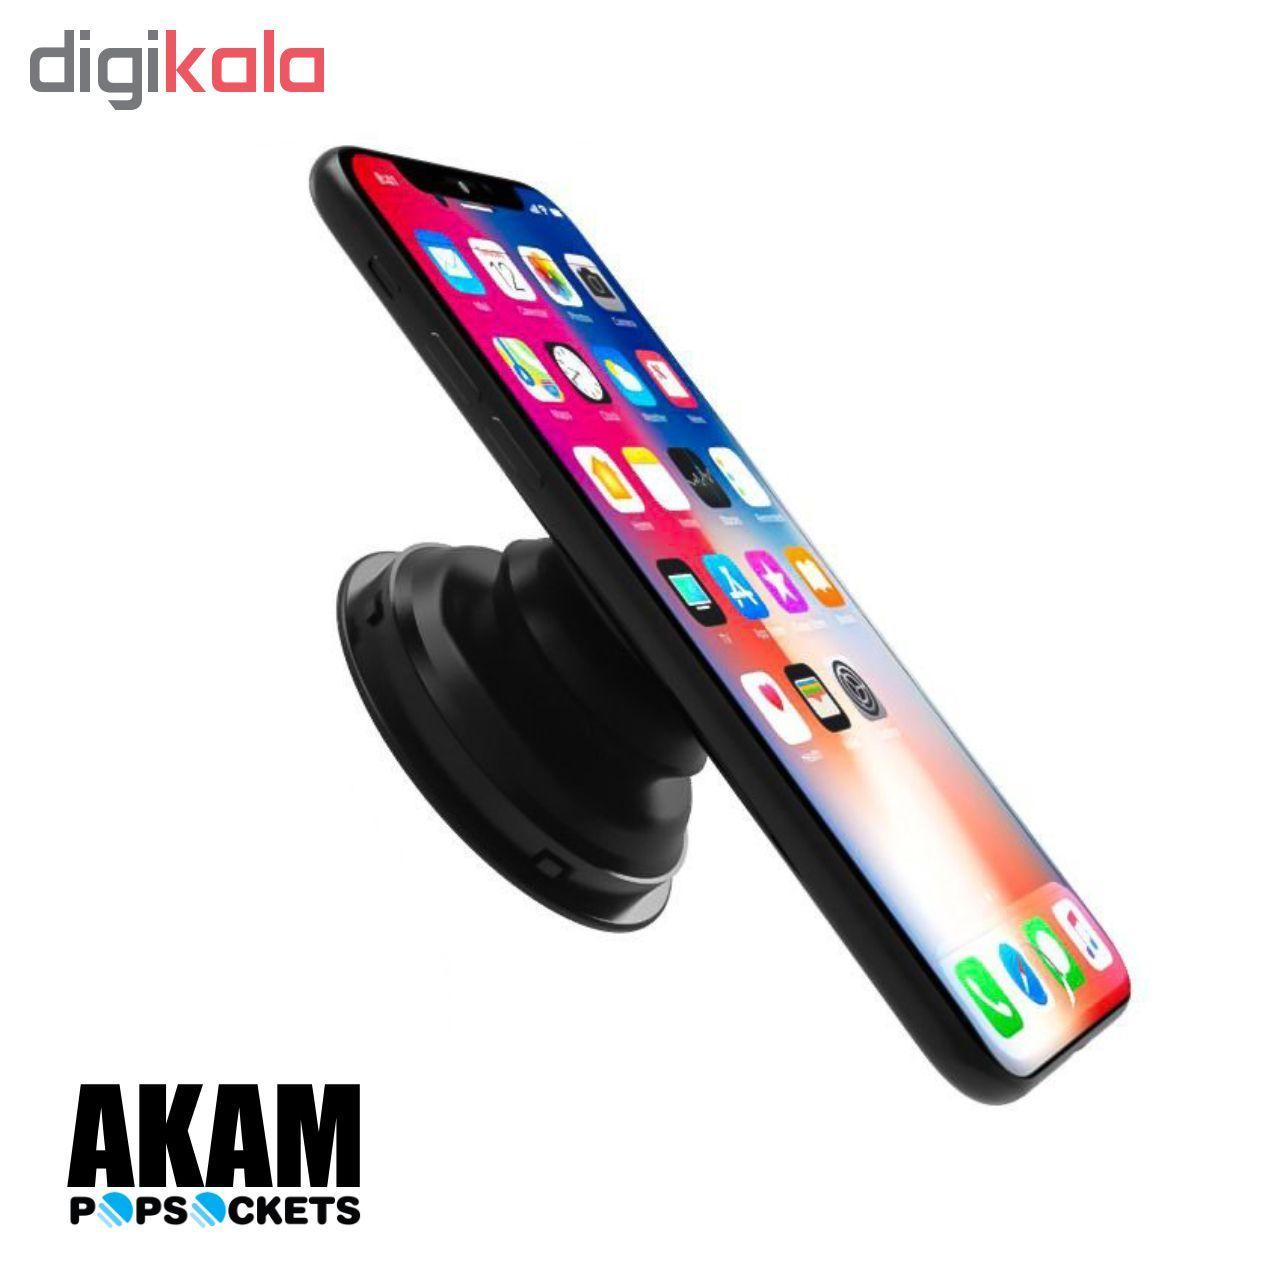 پایه نگهدارنده گوشی موبایل پاپ سوکت آکام مدل APS0195 main 1 6